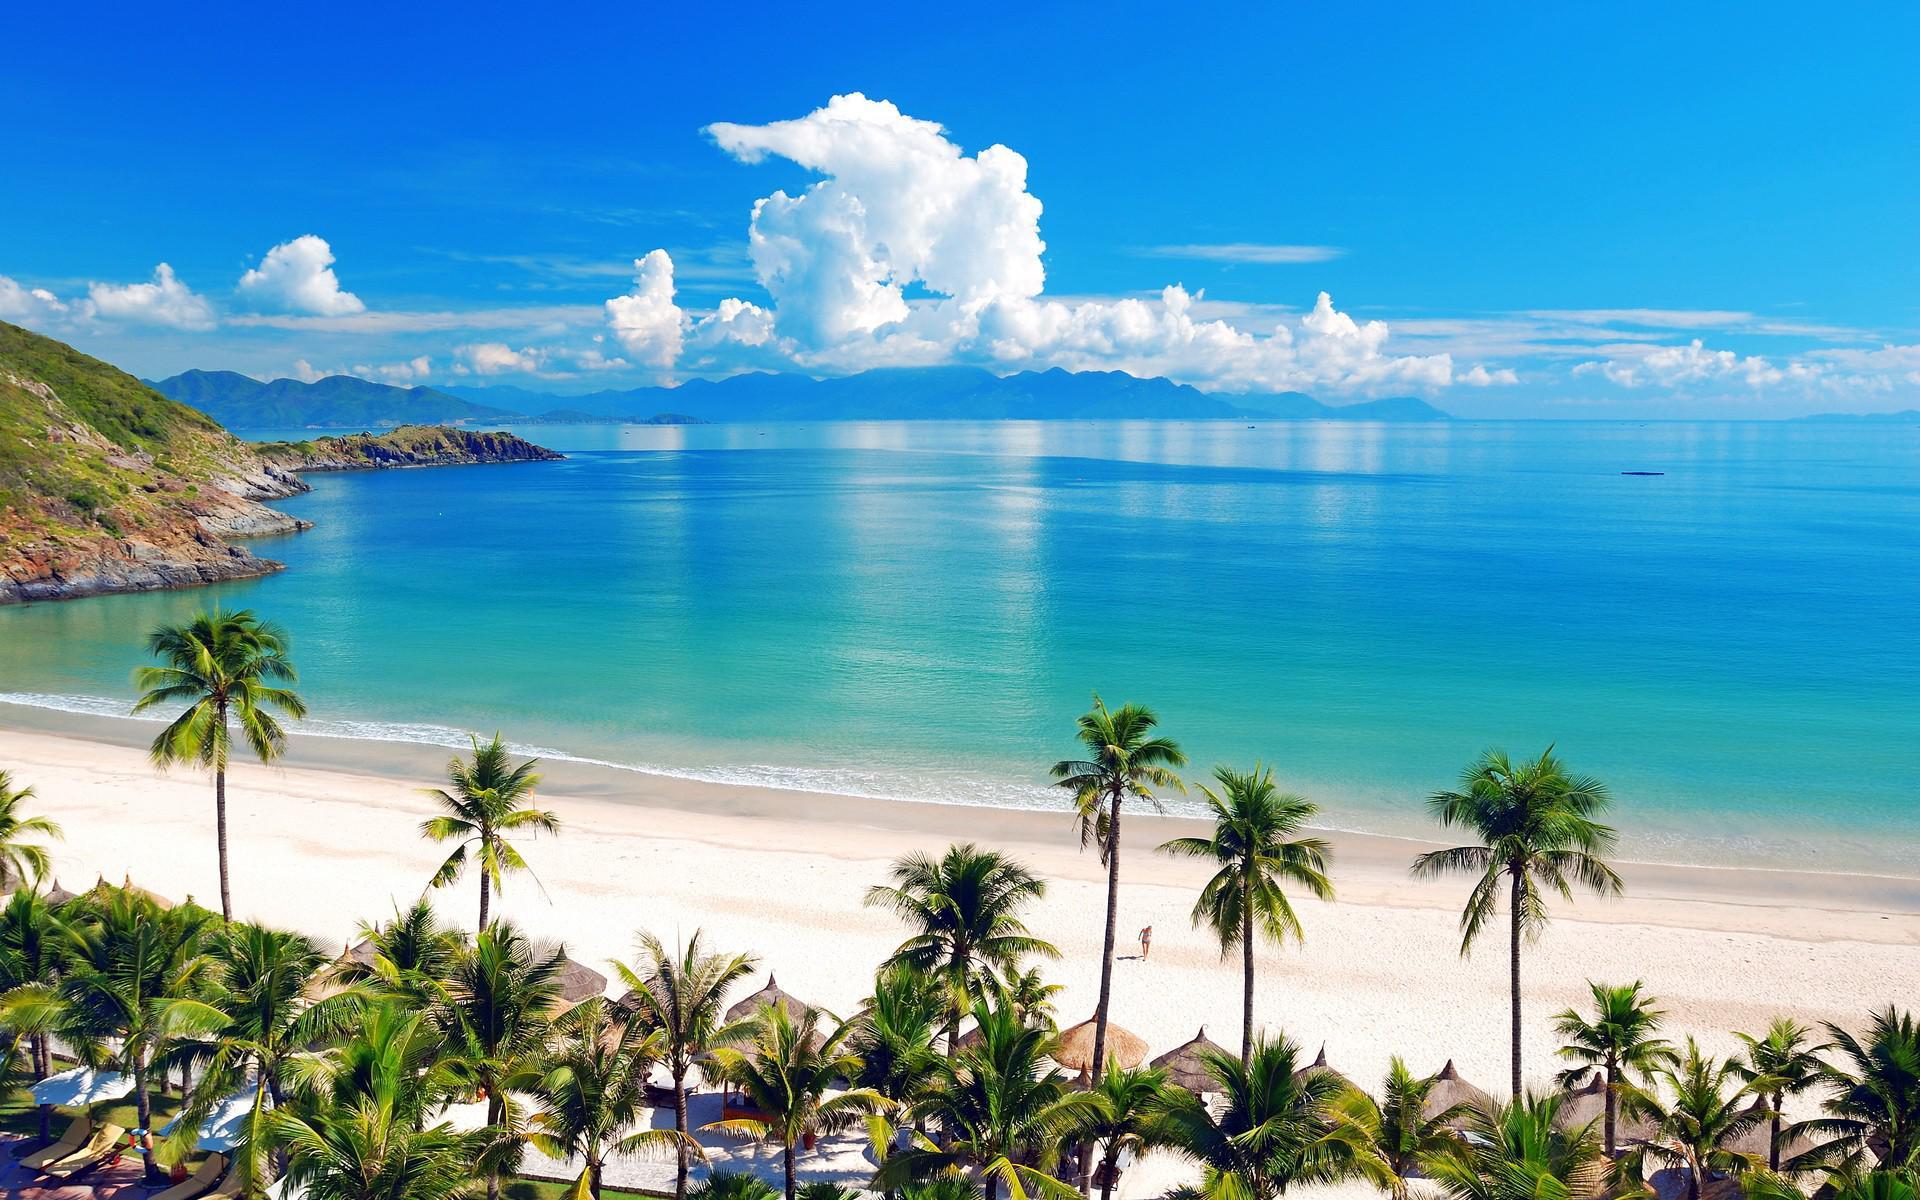 načanga, nha trang, vjetnama, pludmale vjetnama